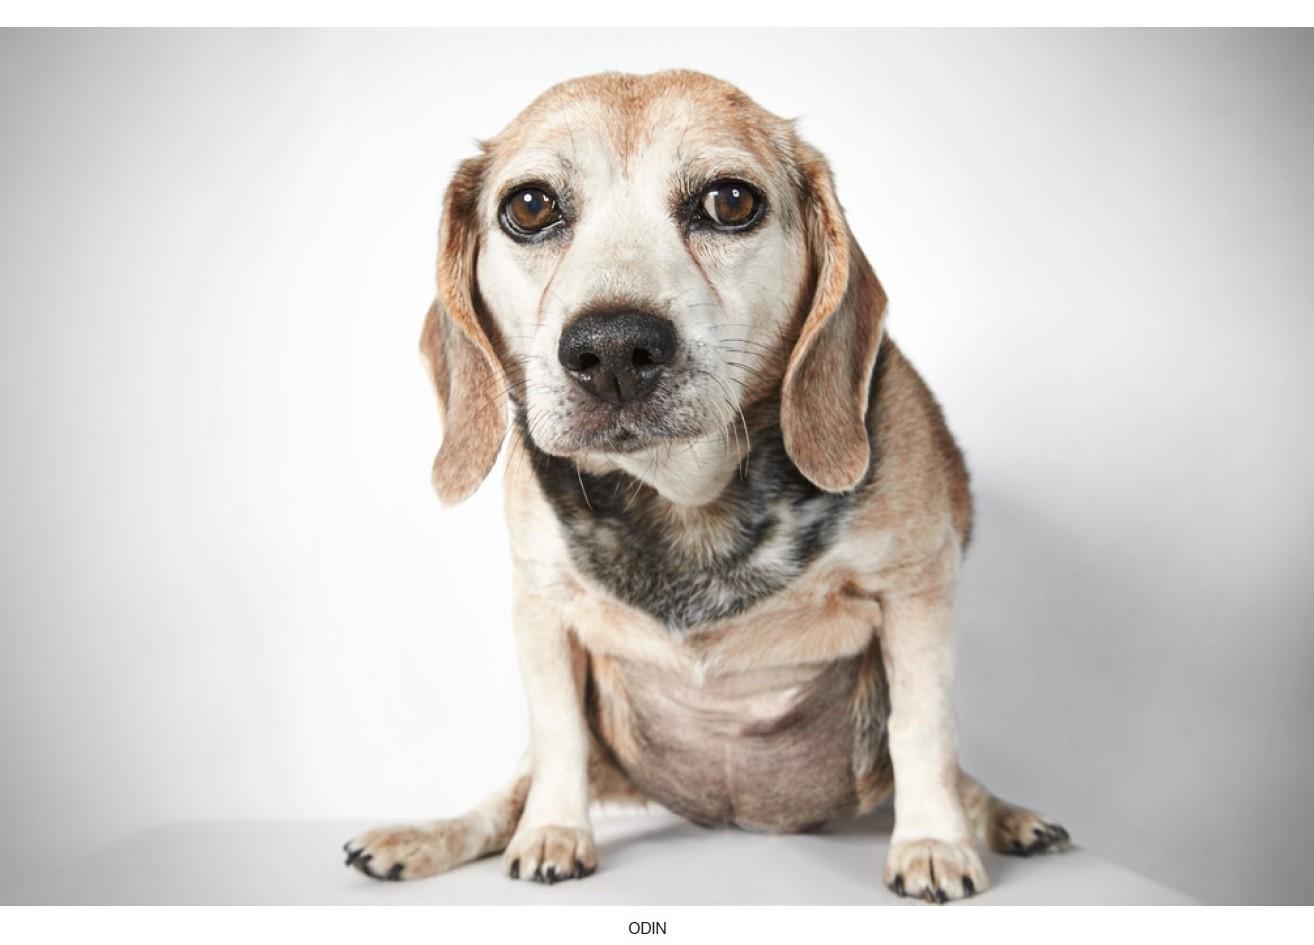 Beagle dalmation mix